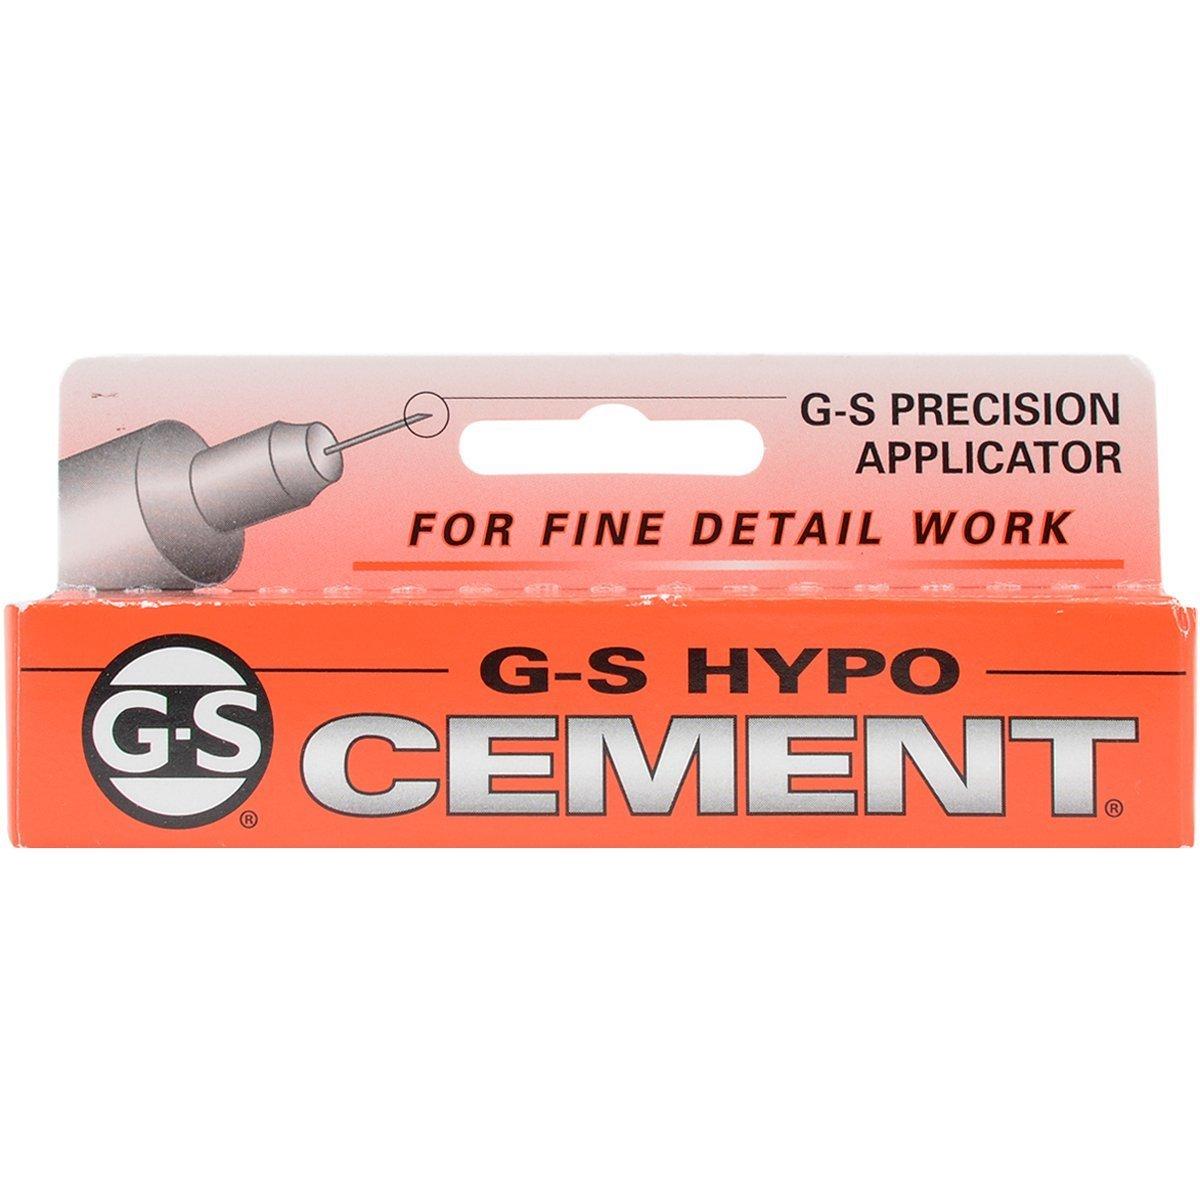 B000YQDX86 G-S Hypo Cement 61vSkn2tm9L